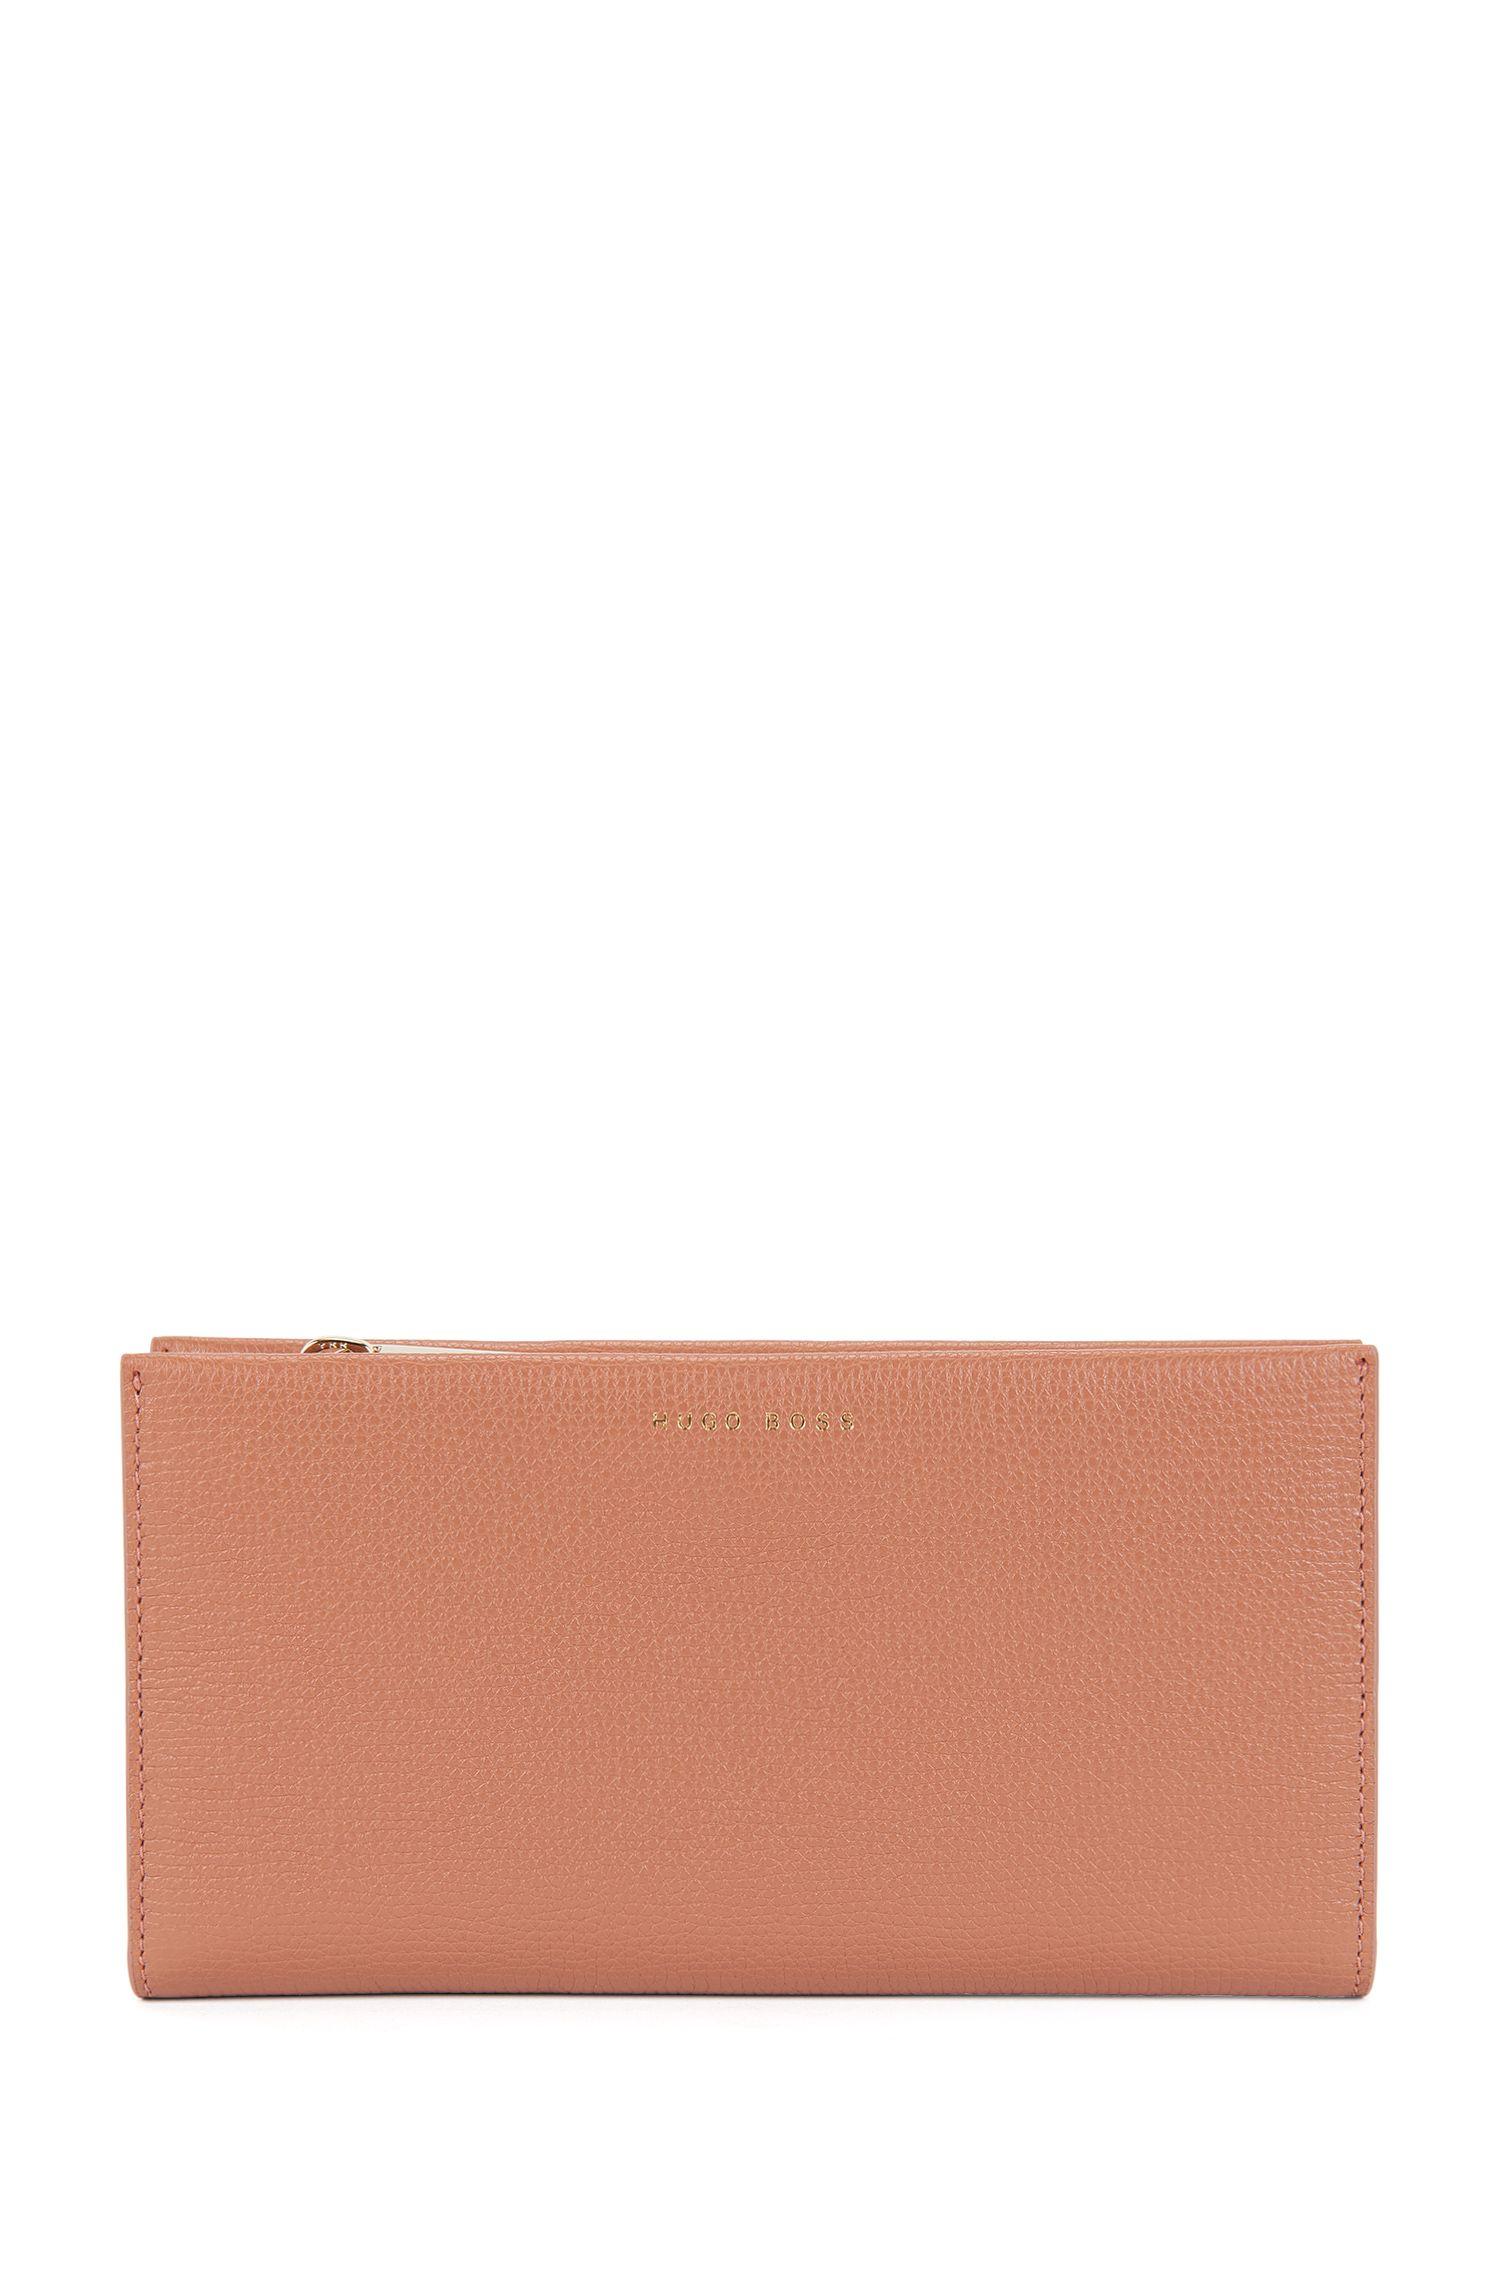 Ziparound wallet in grained calfskin leather